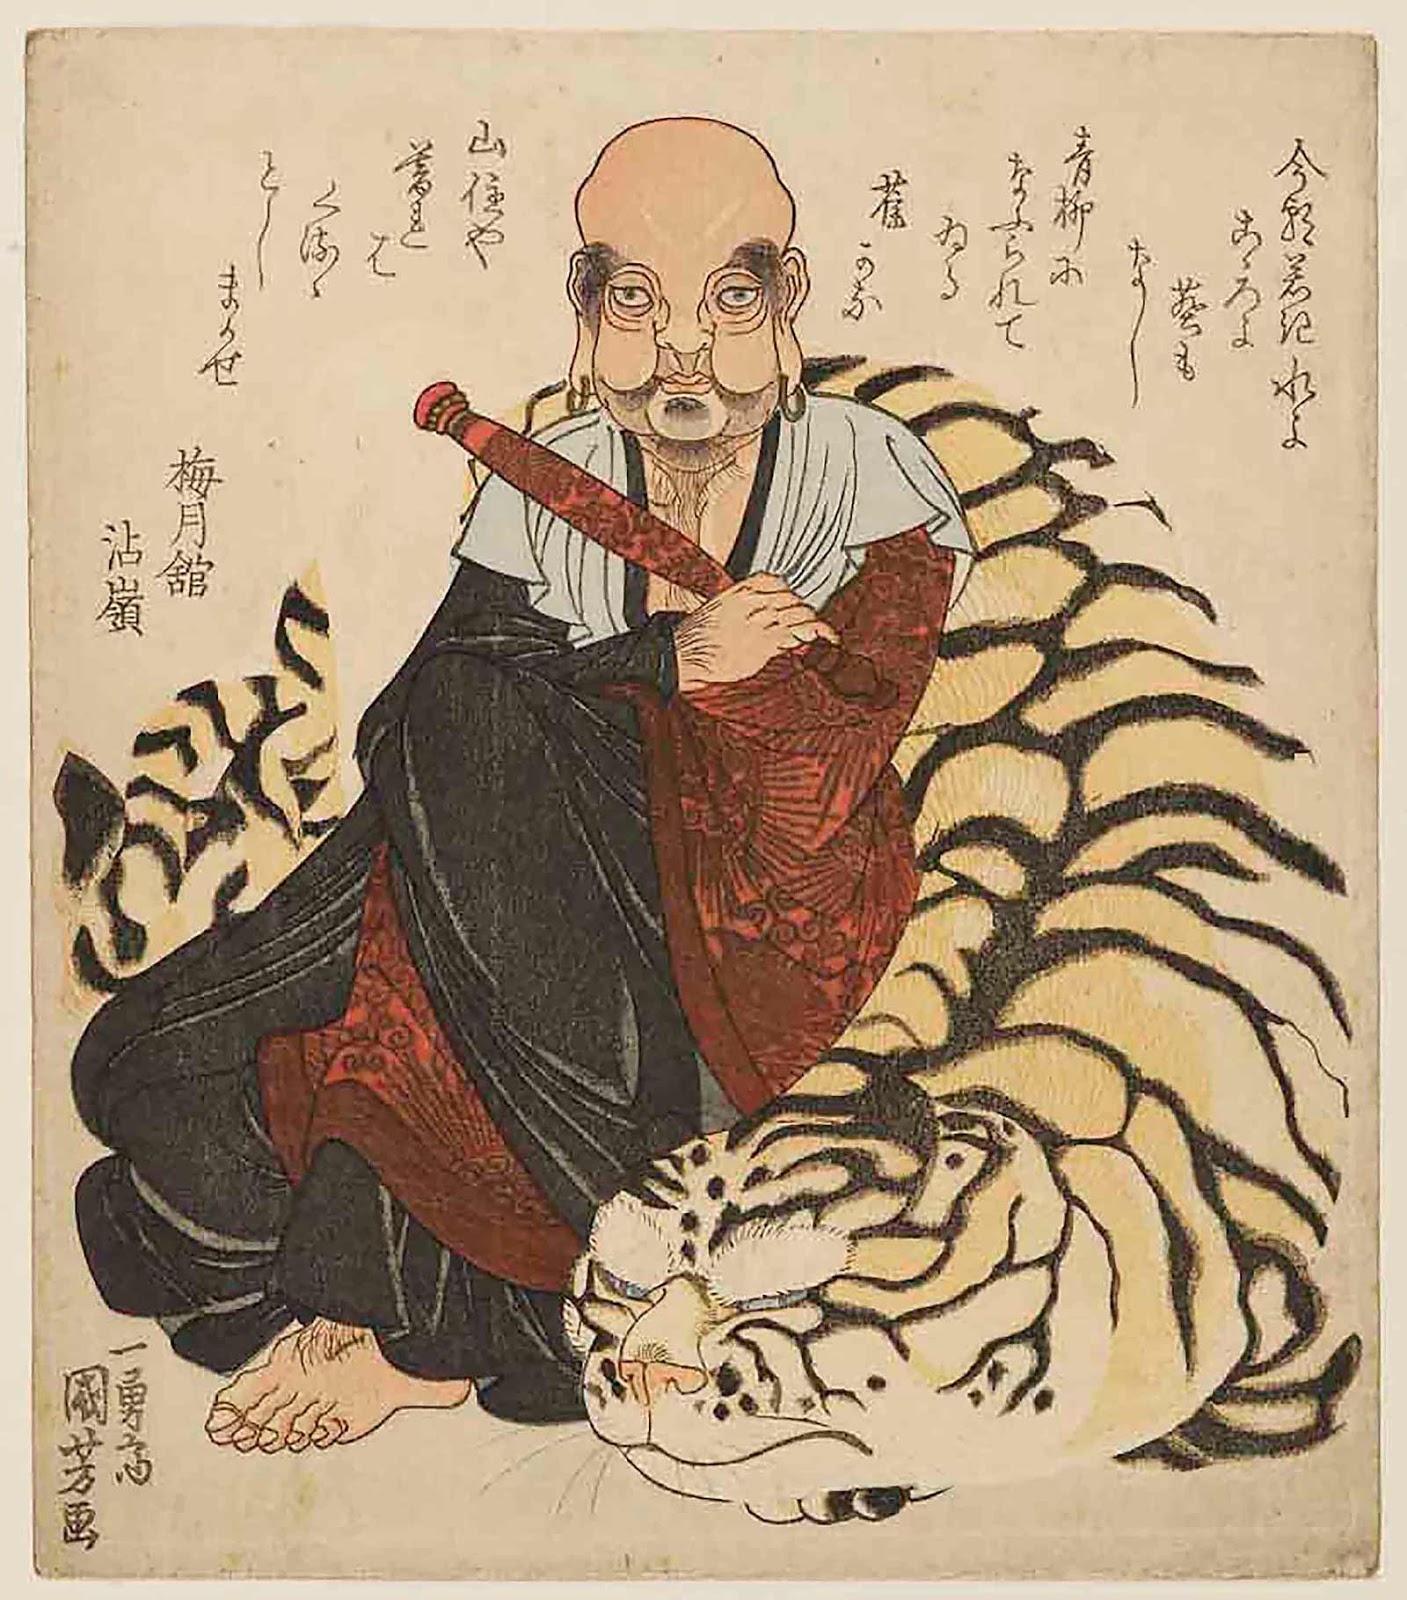 Arhat  com Tigre , de Utagawa Kunyoshi (c. 1820).